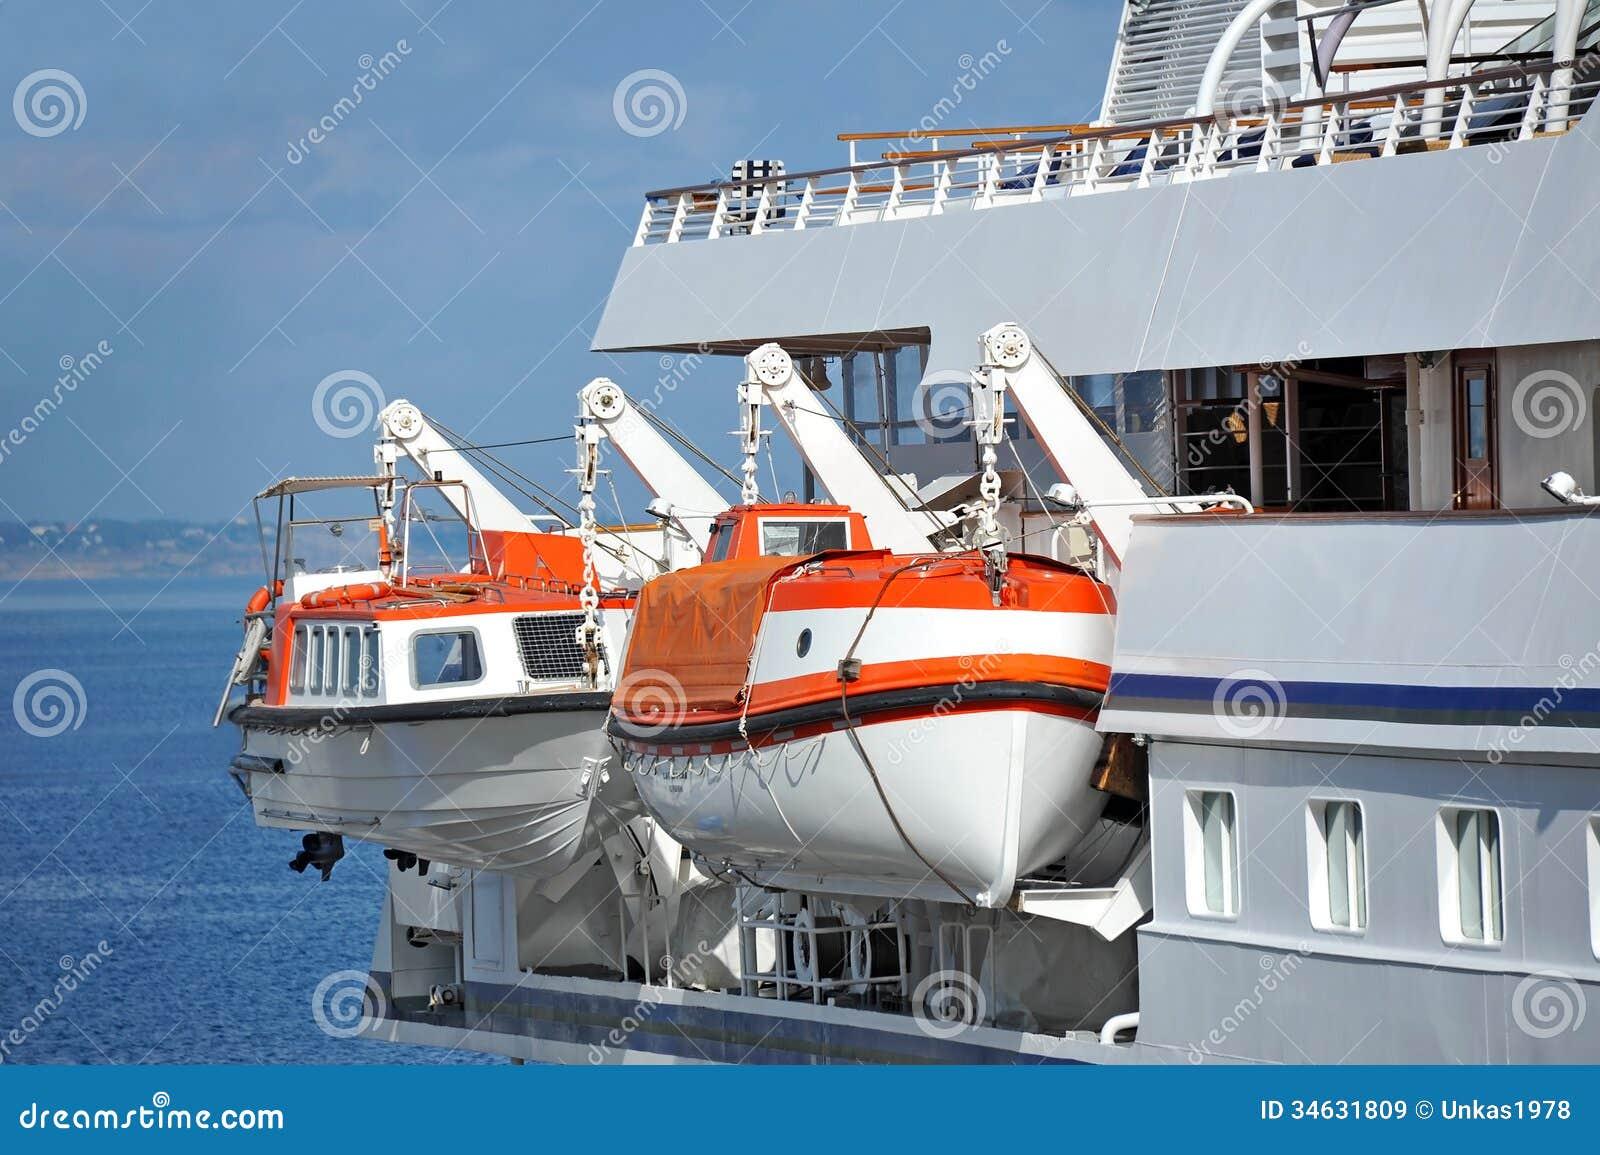 Cruise Ship Lifeboats Outdoor Background Boat Nobody Stock Photo ...